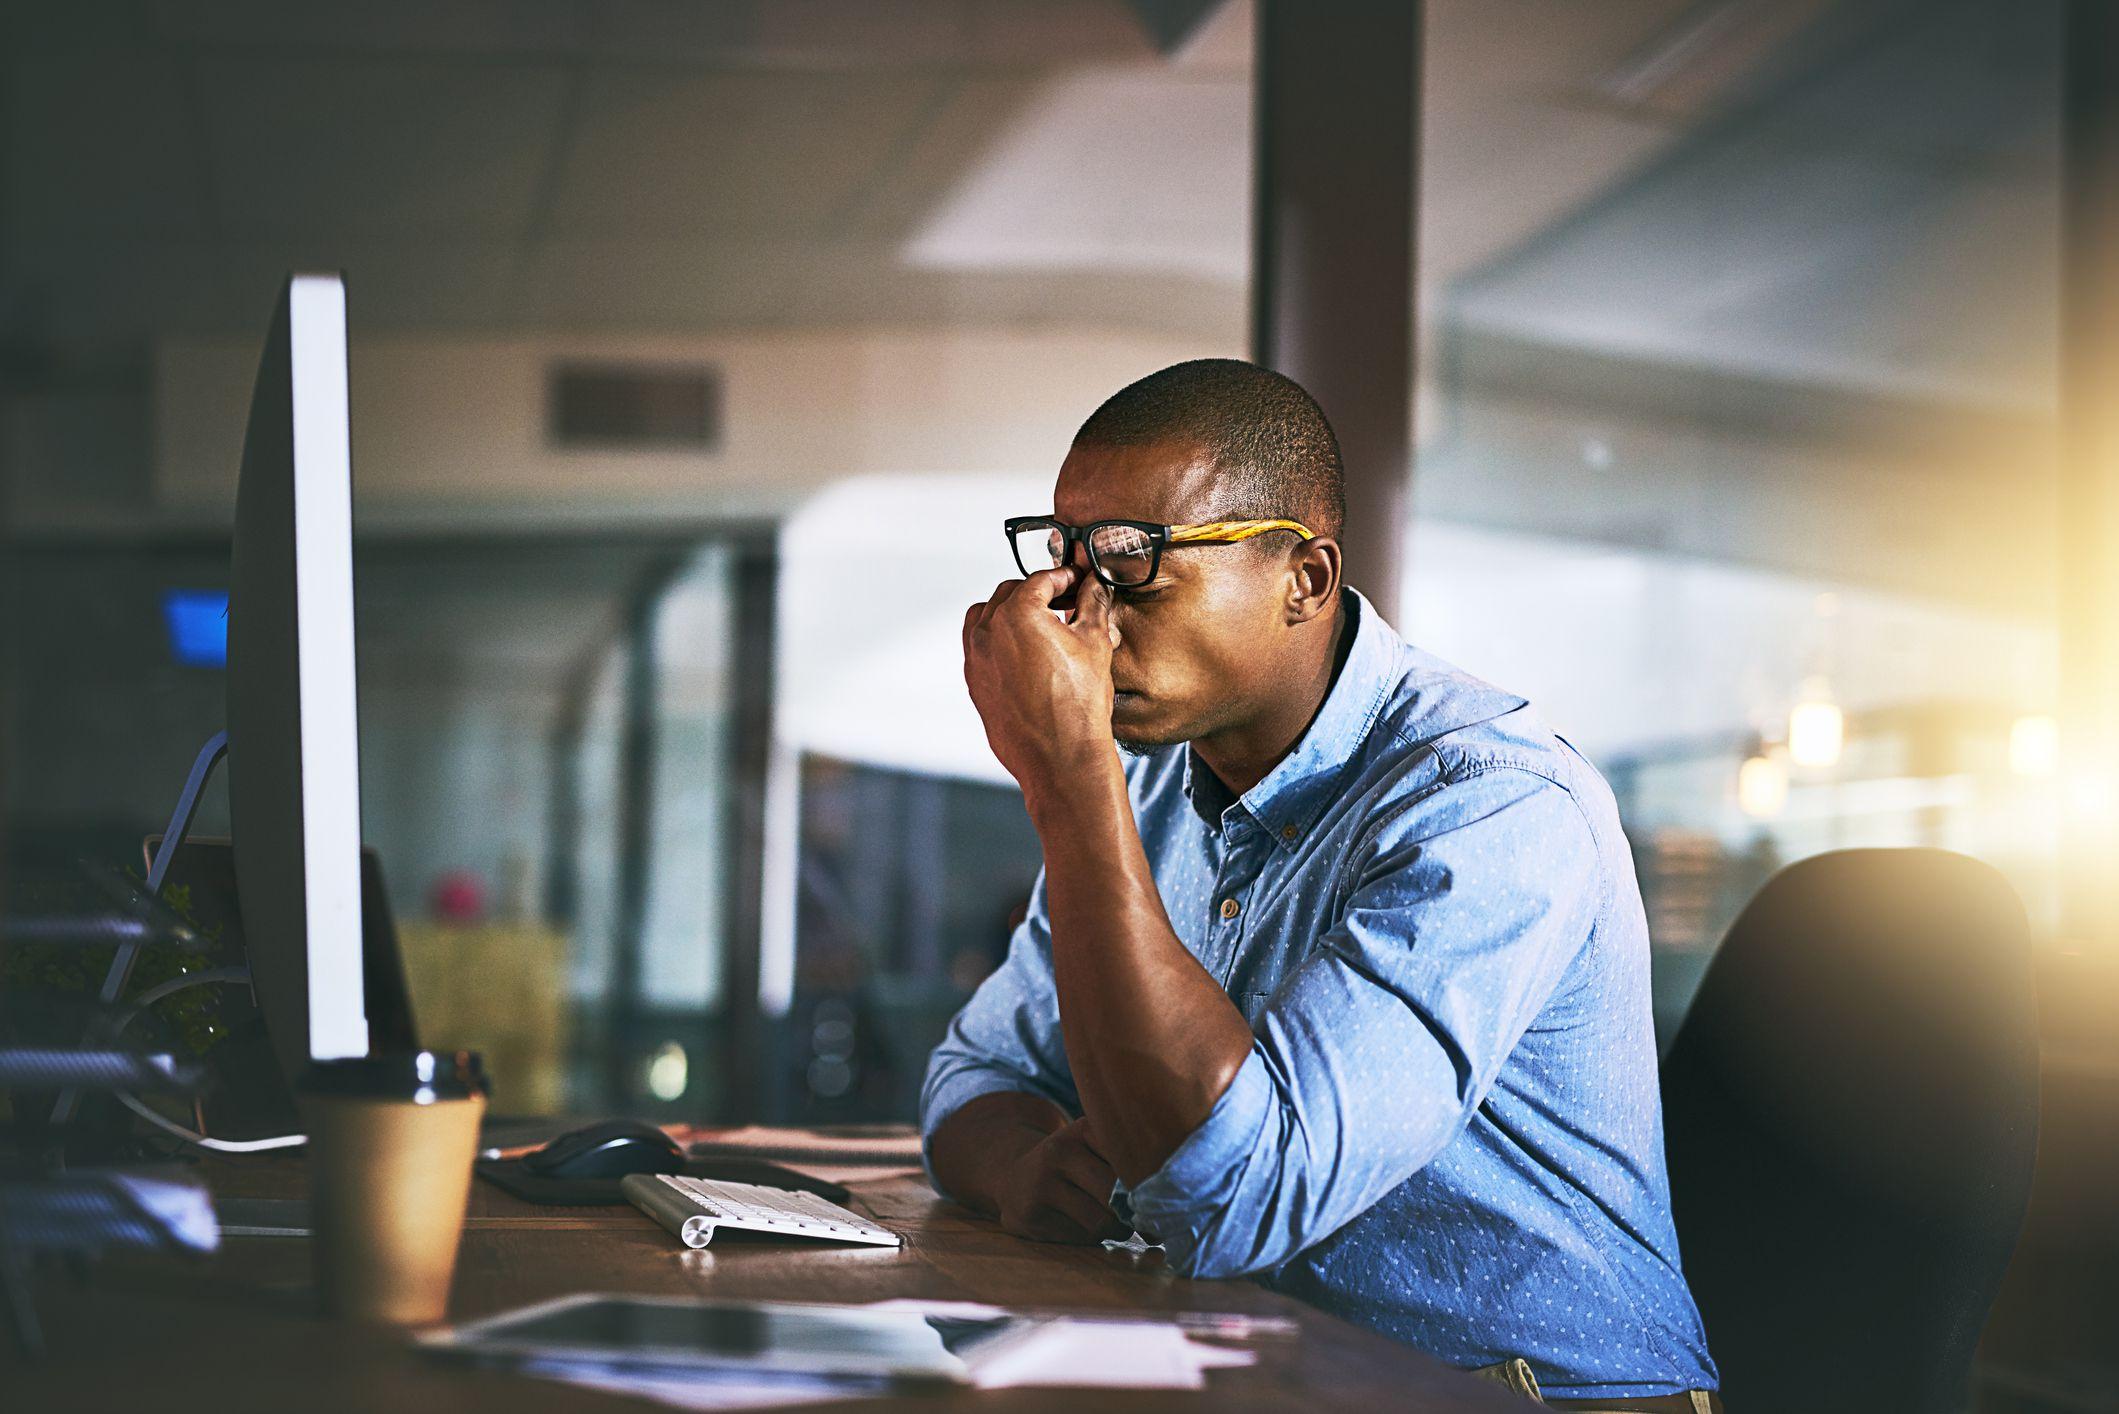 Sobrecarga no trabalho: entenda 8 maneiras de evita-la